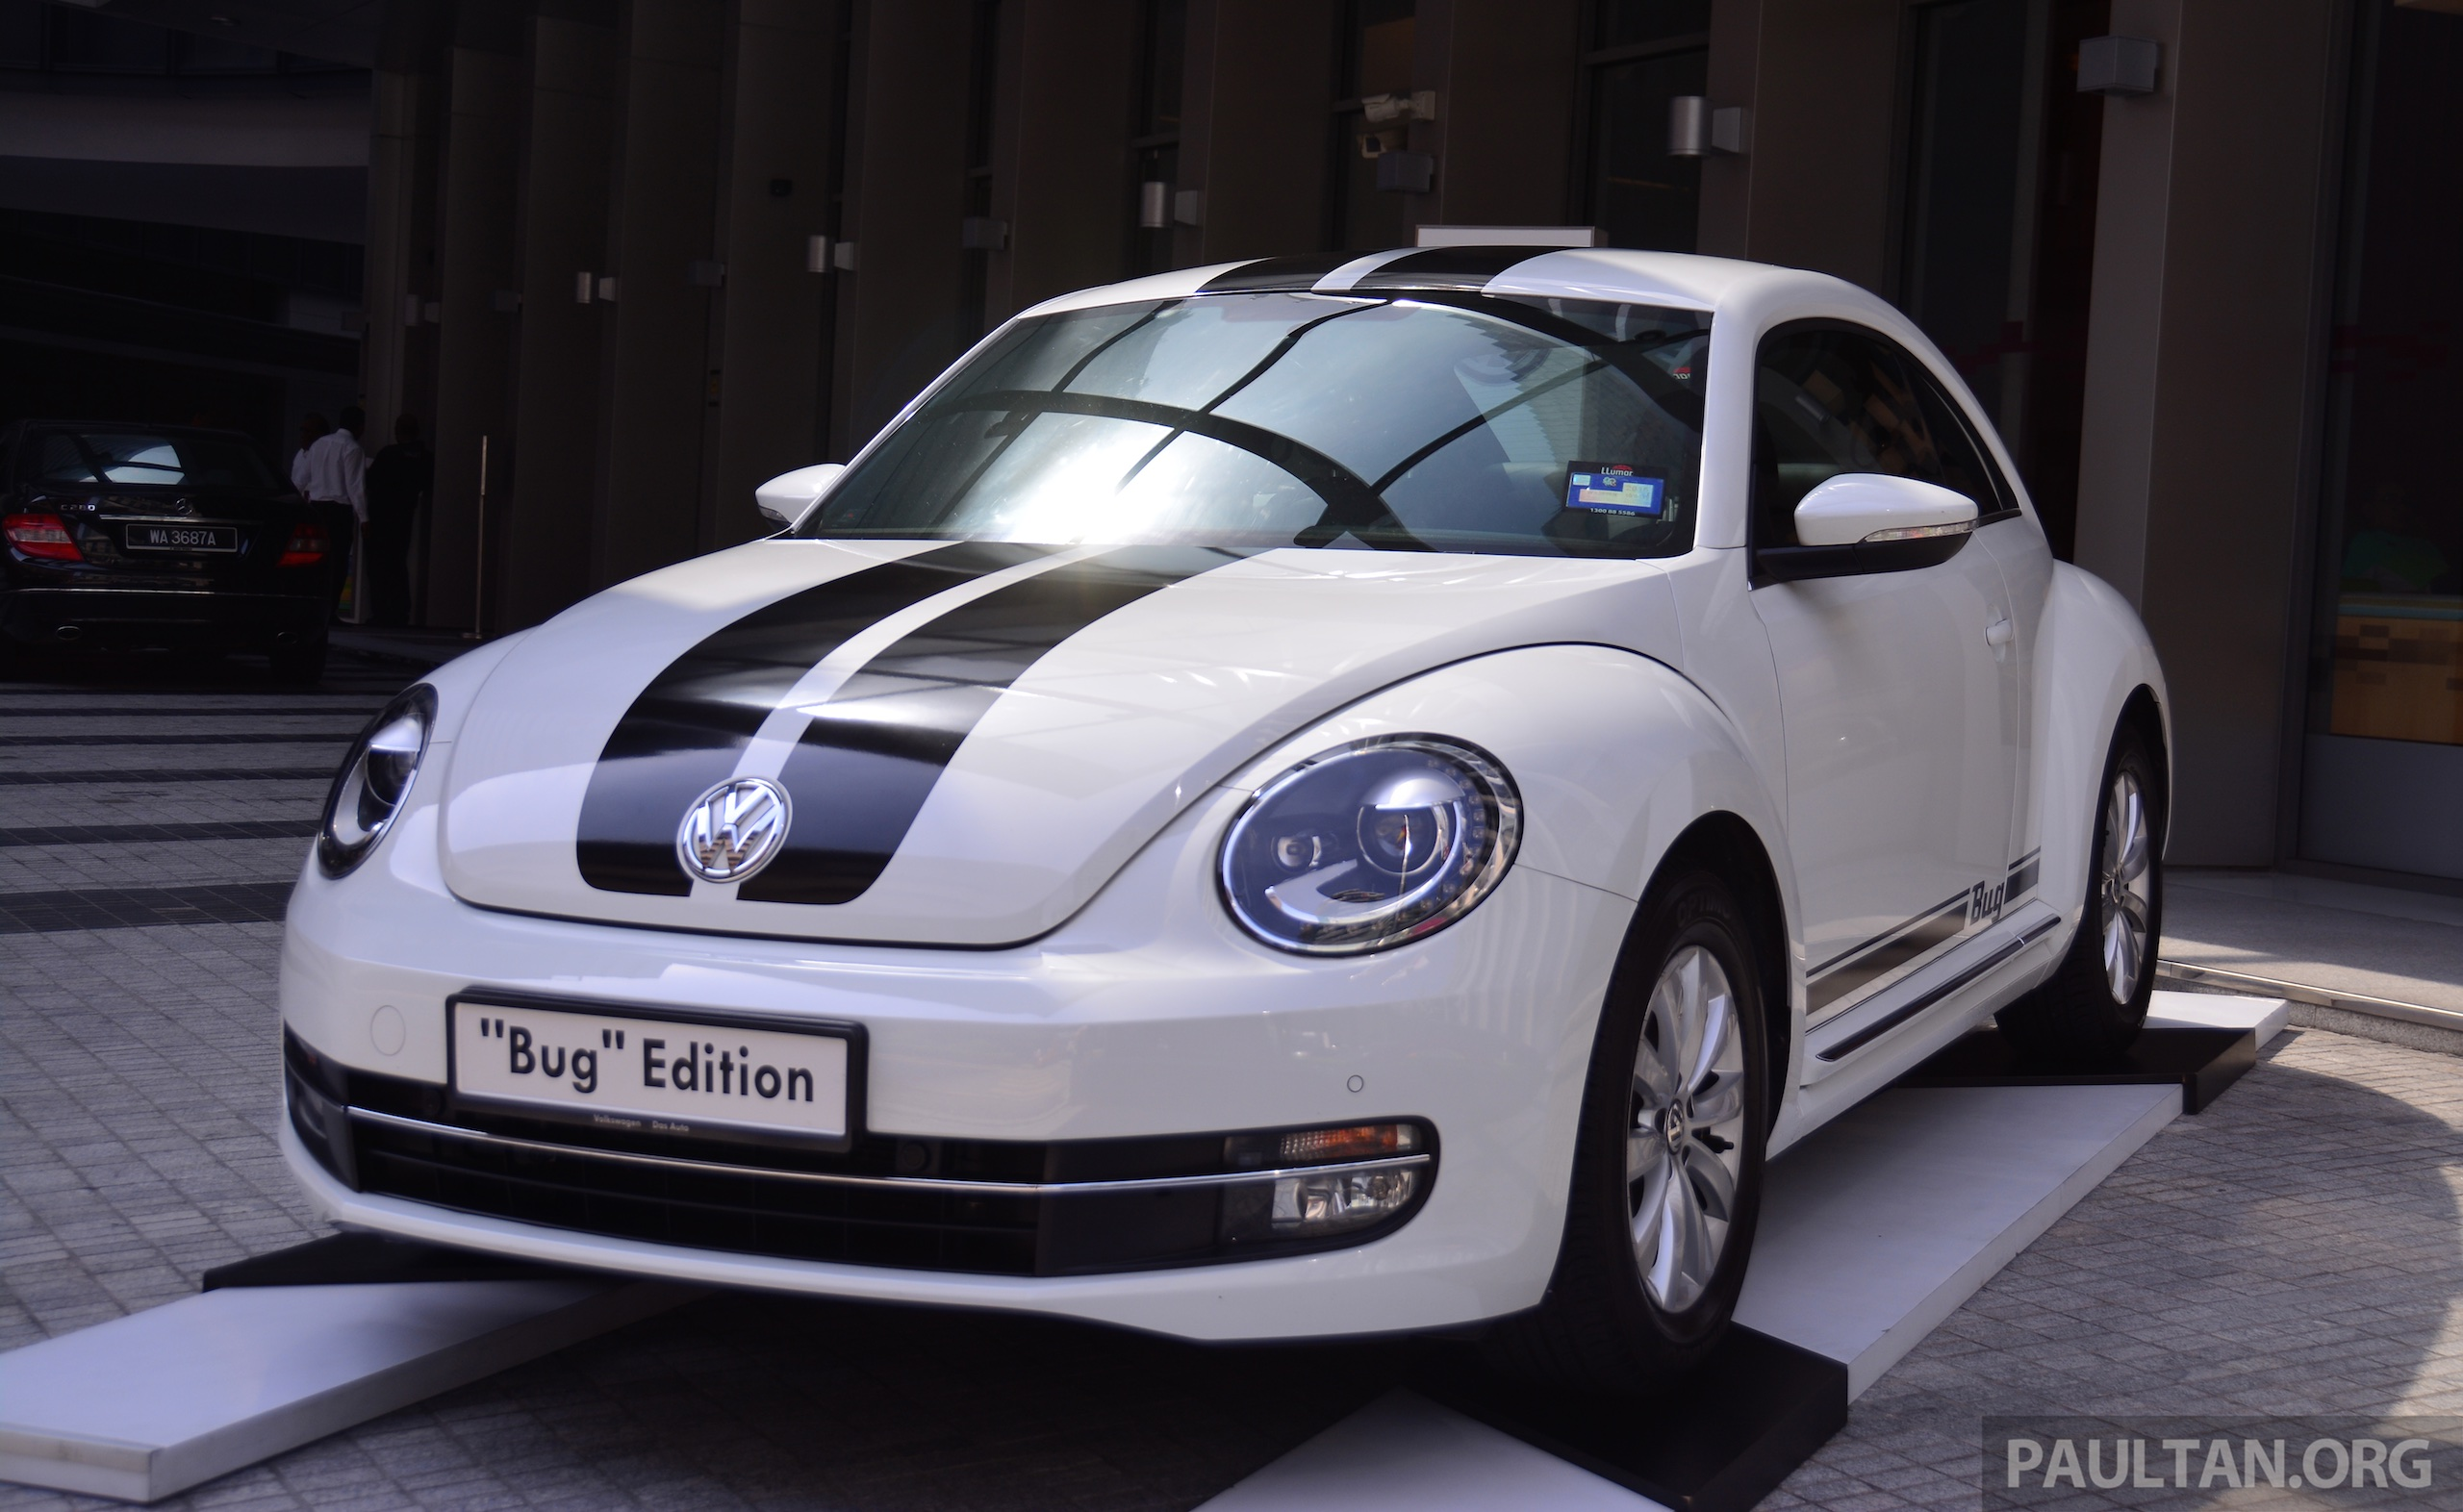 Volkswagen Beetle Bug Edition Launched Rm147k Paultan Org